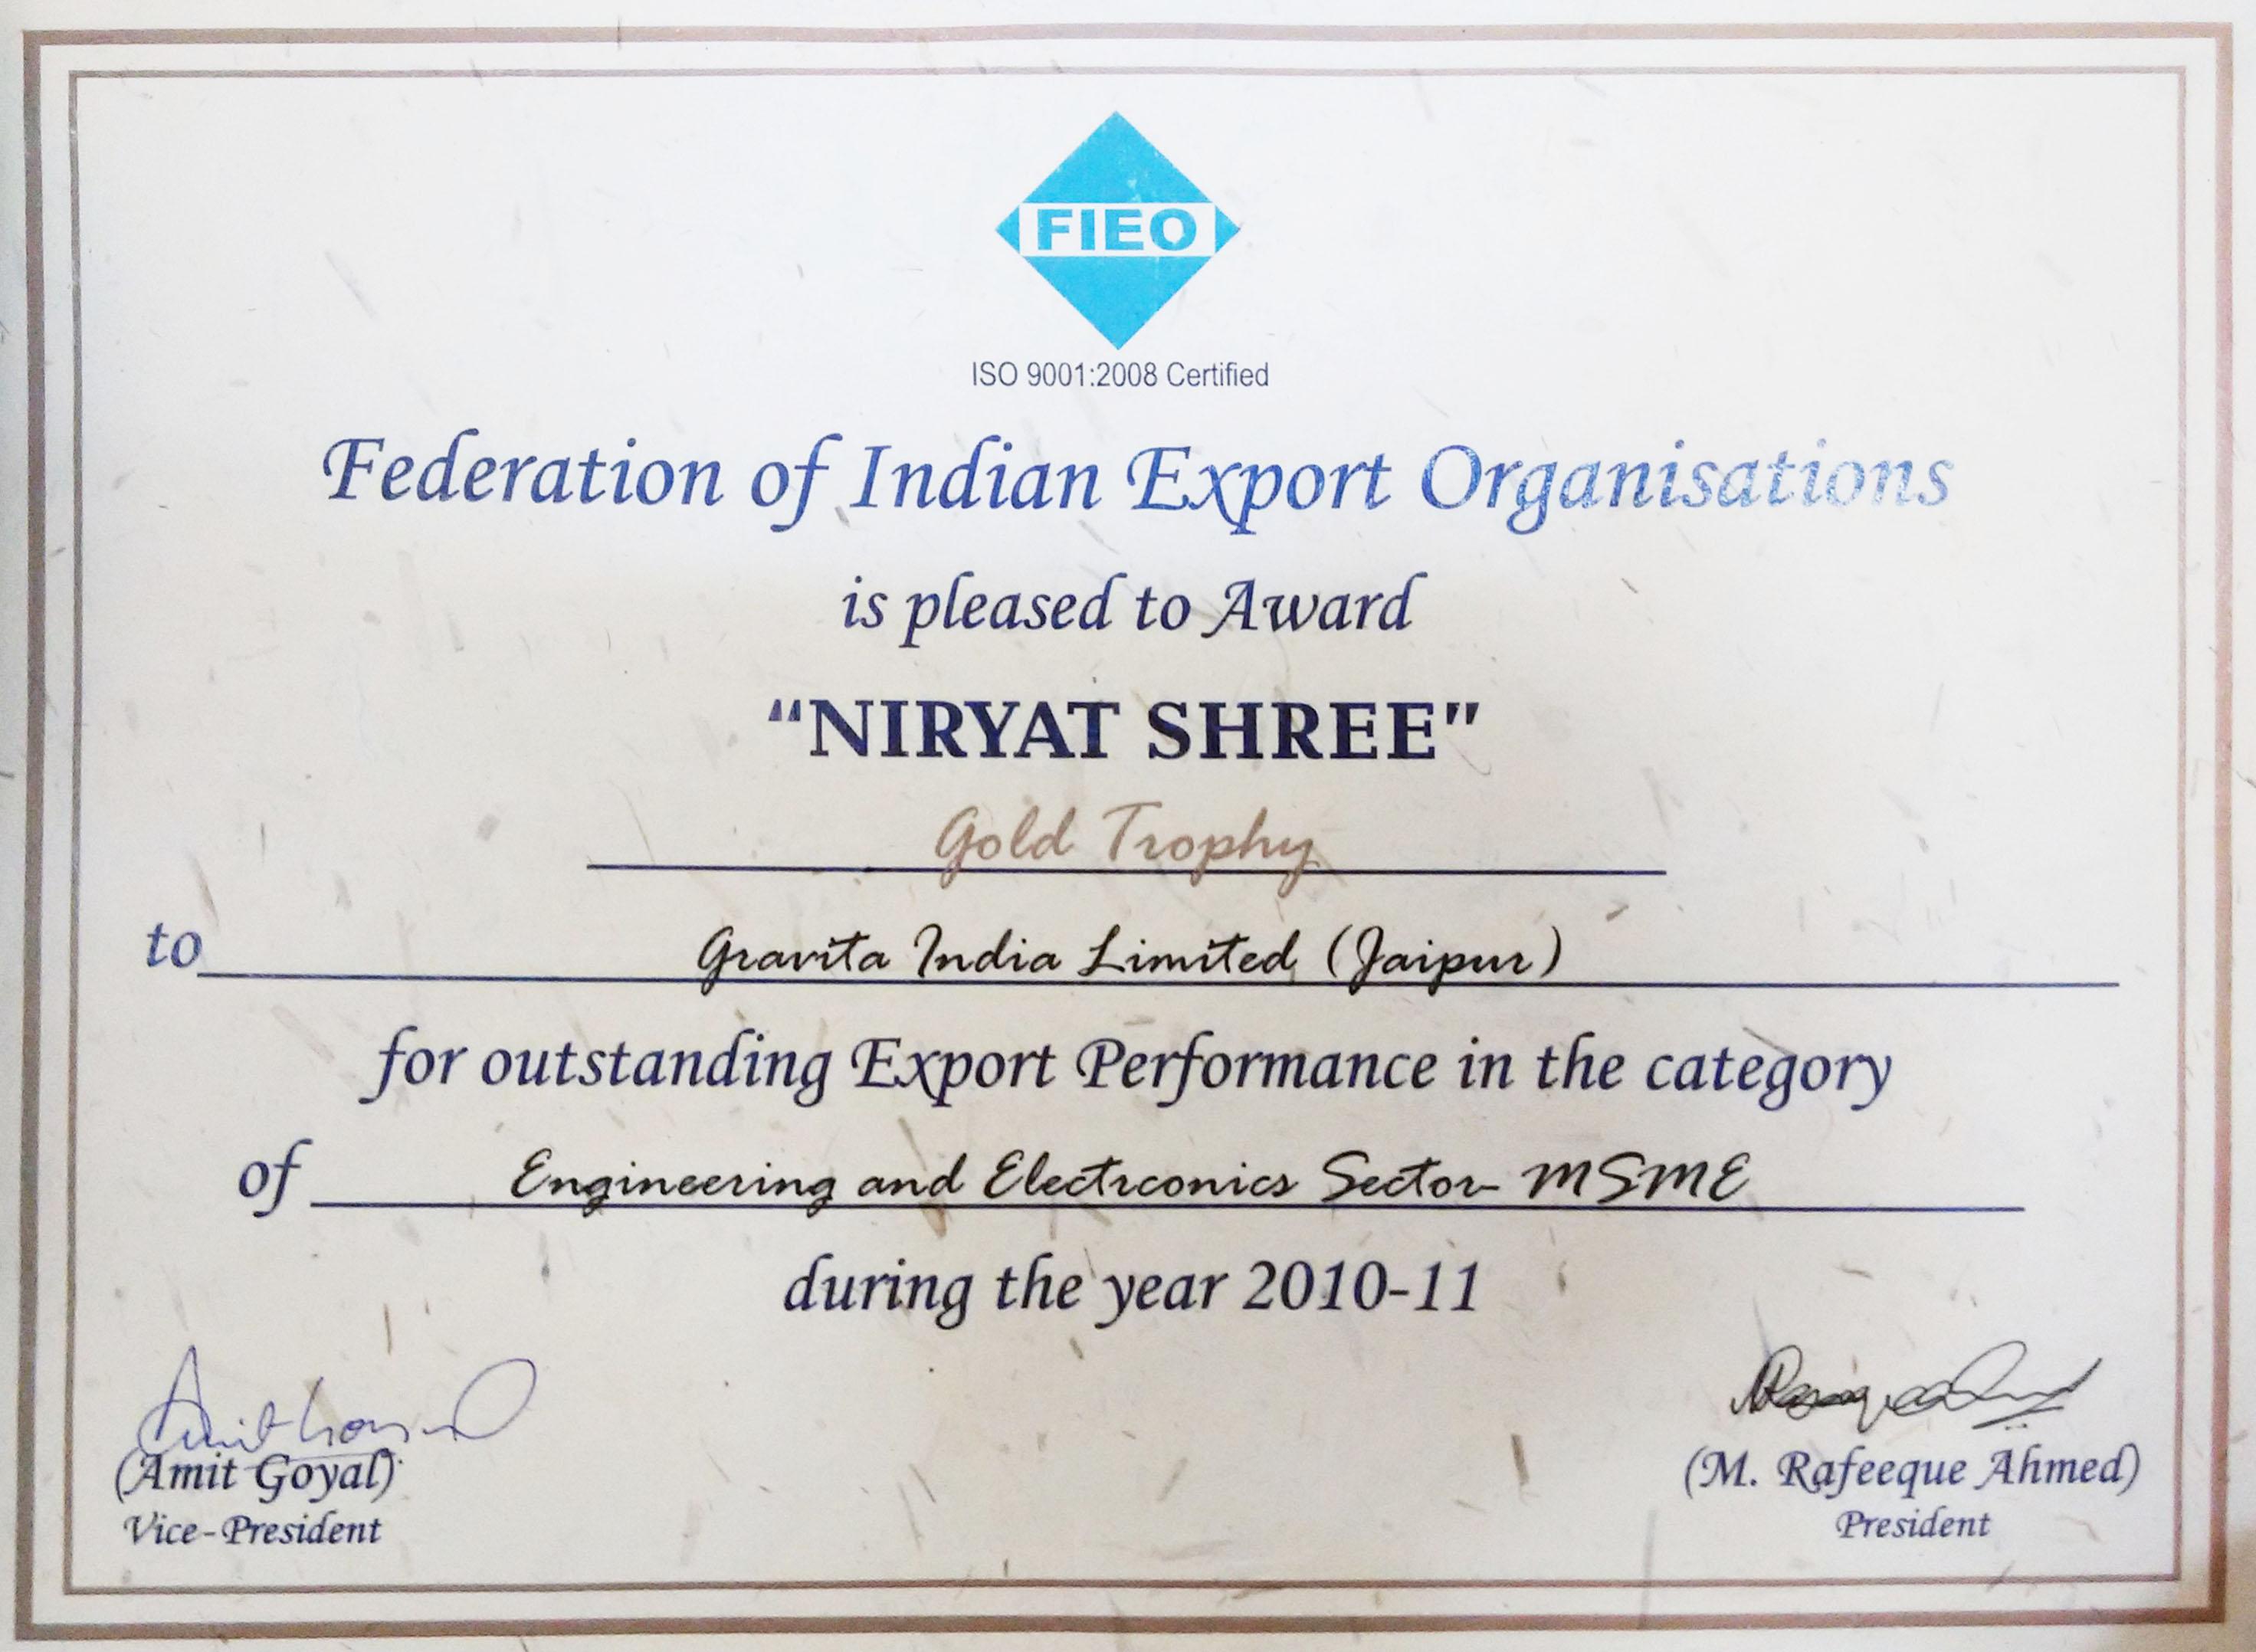 Gravita gets niryat shree award gravita india ltd niryat shree award certificate xflitez Gallery